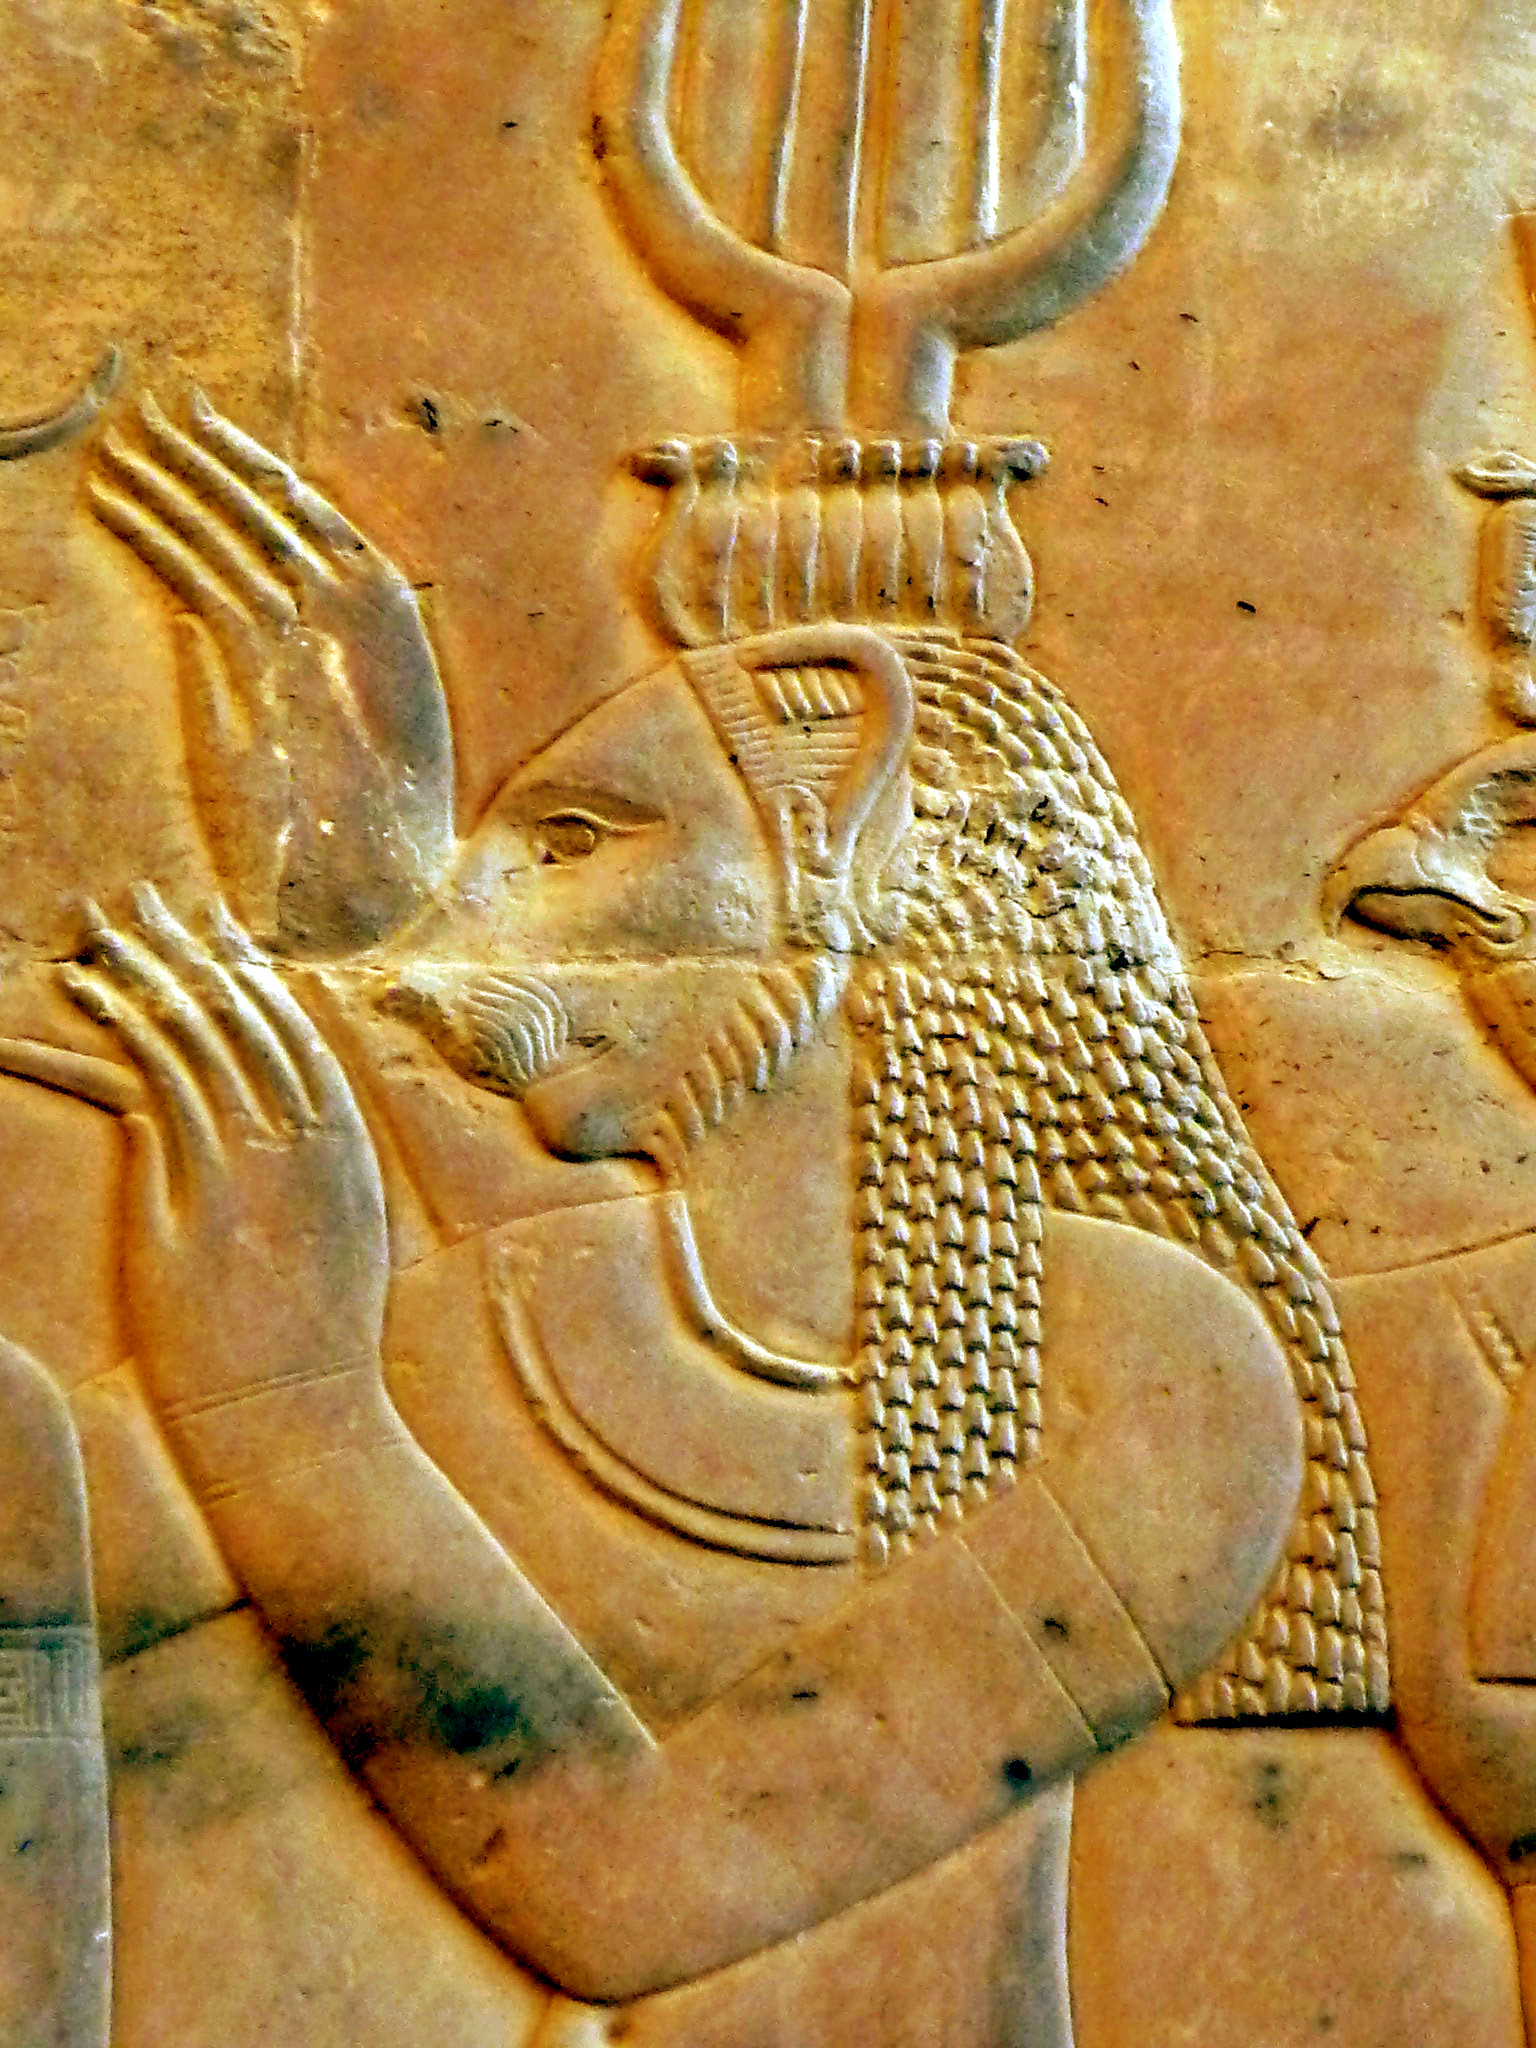 File:Wall relief Kom Ombo16.JPG - Wikimedia Commons